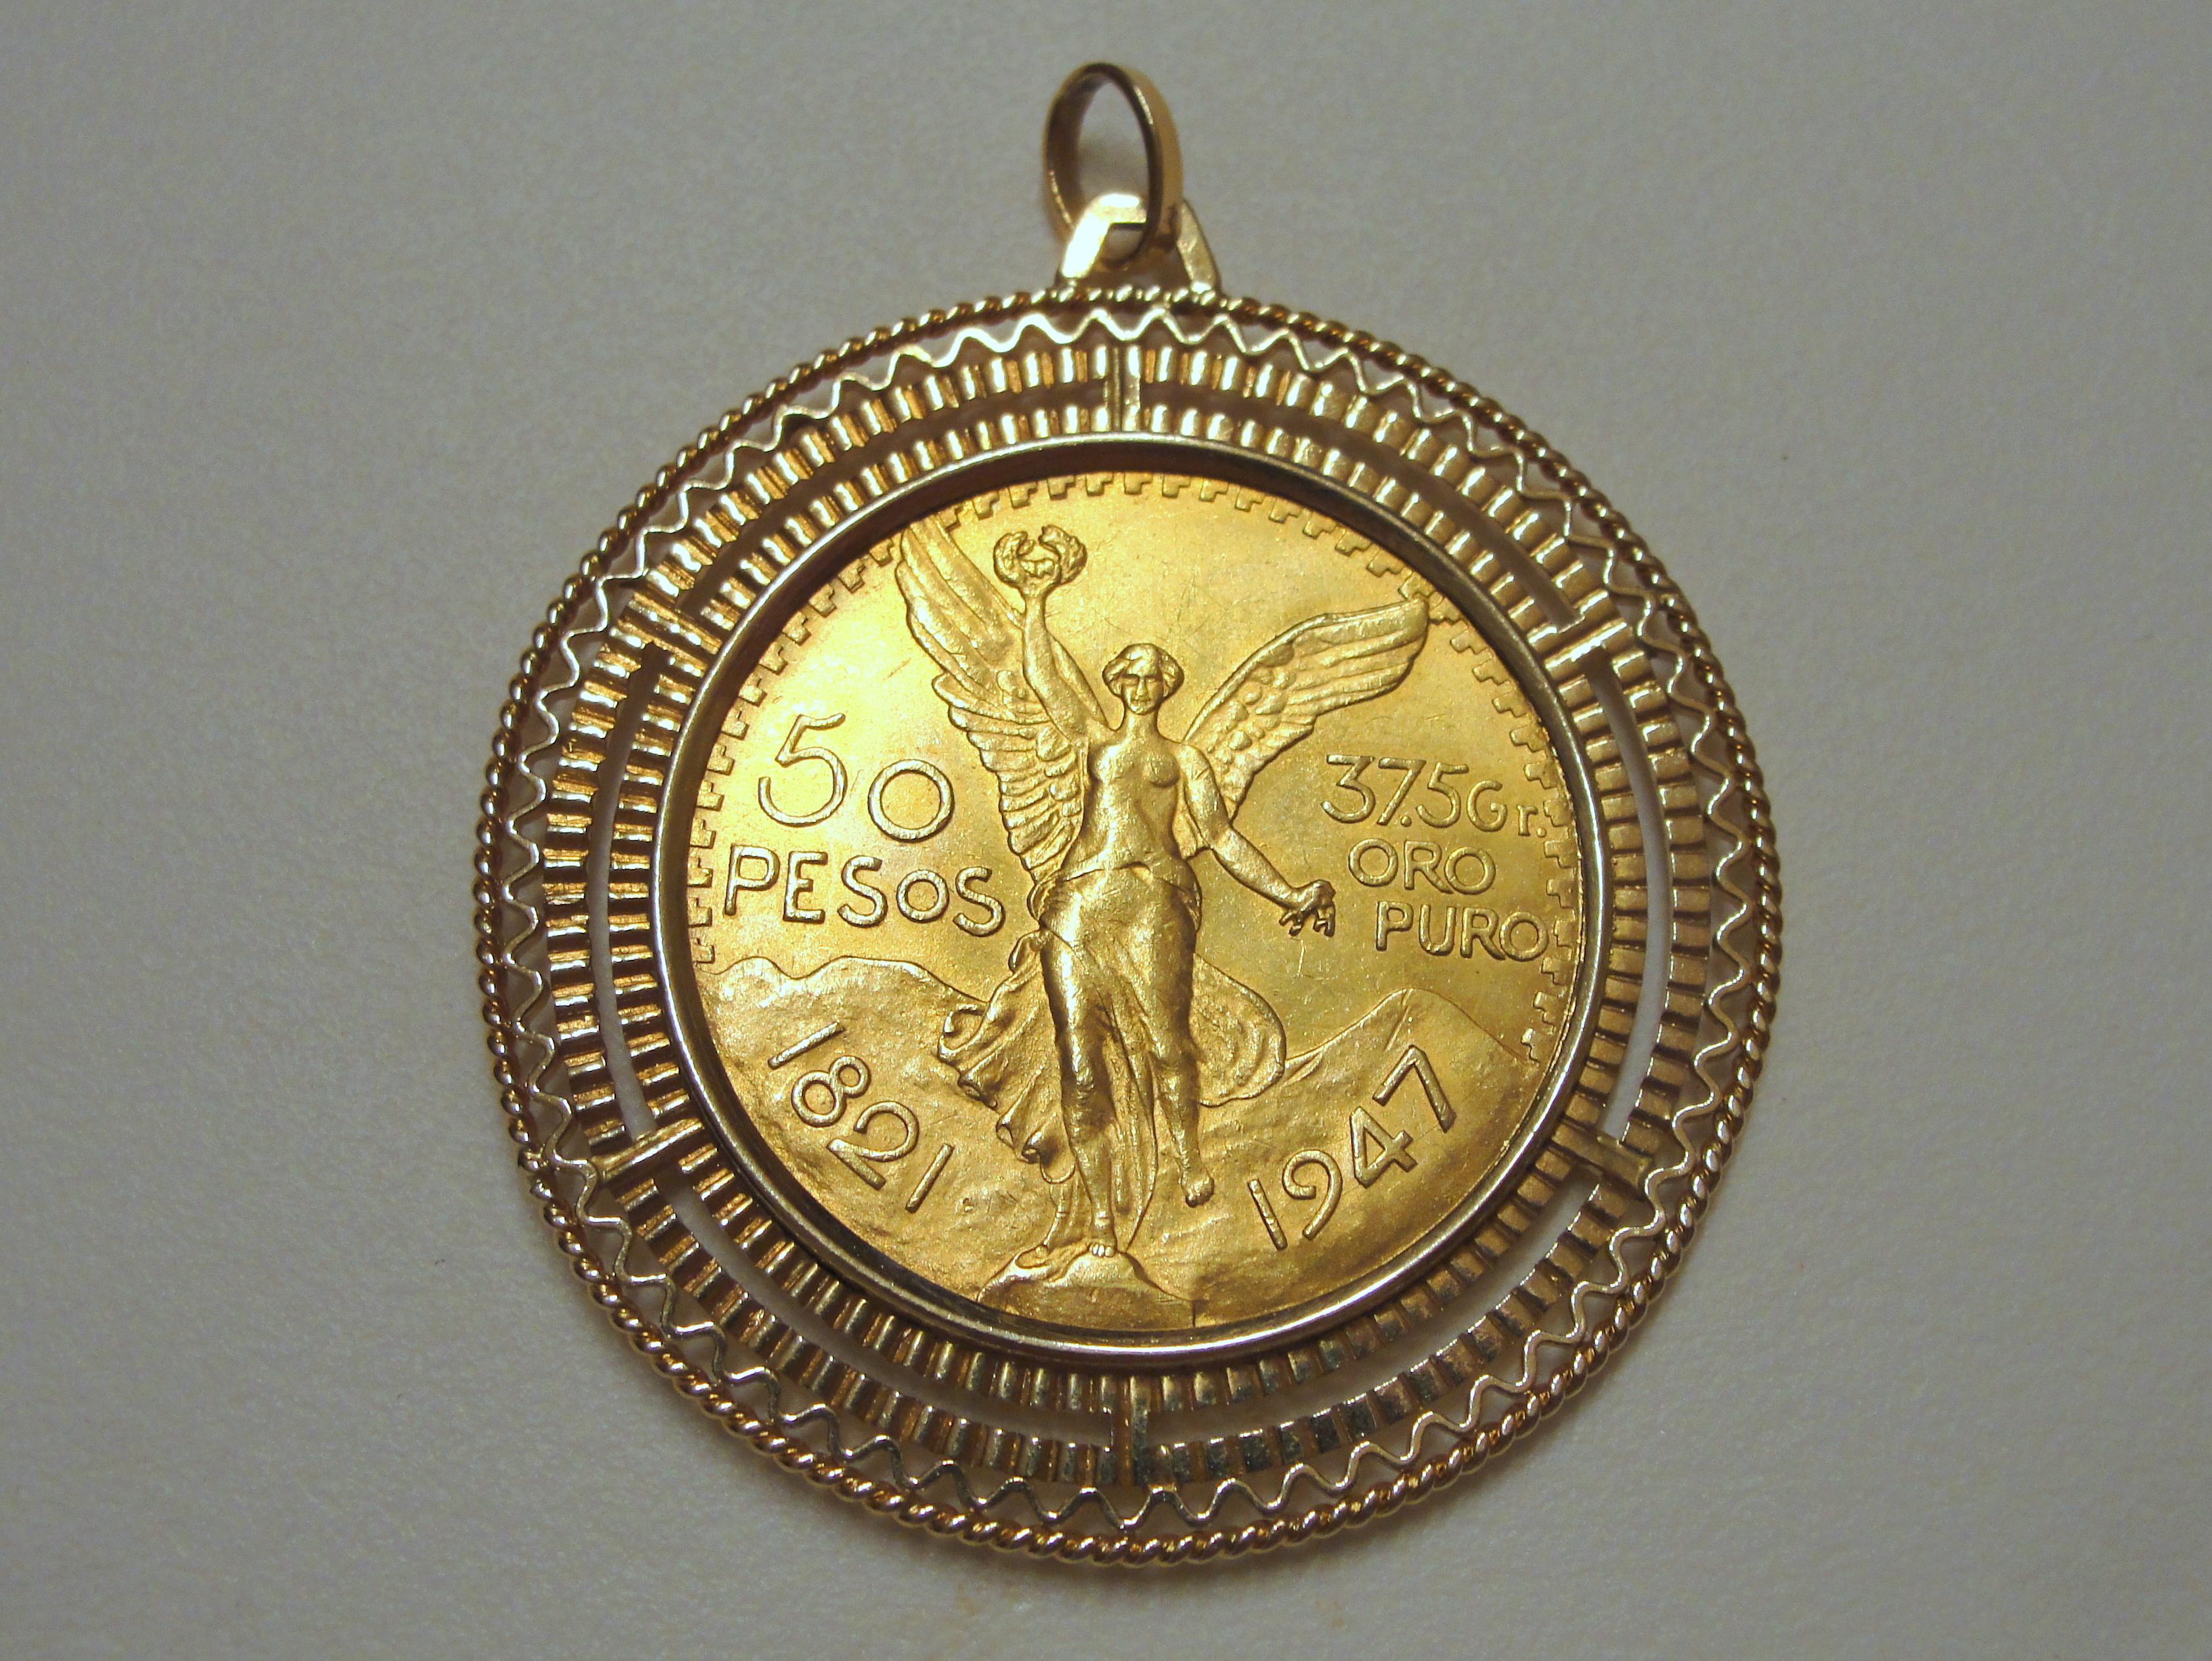 Kostenlose Foto Mexikaner Gold Münze Medaillon Schmuck